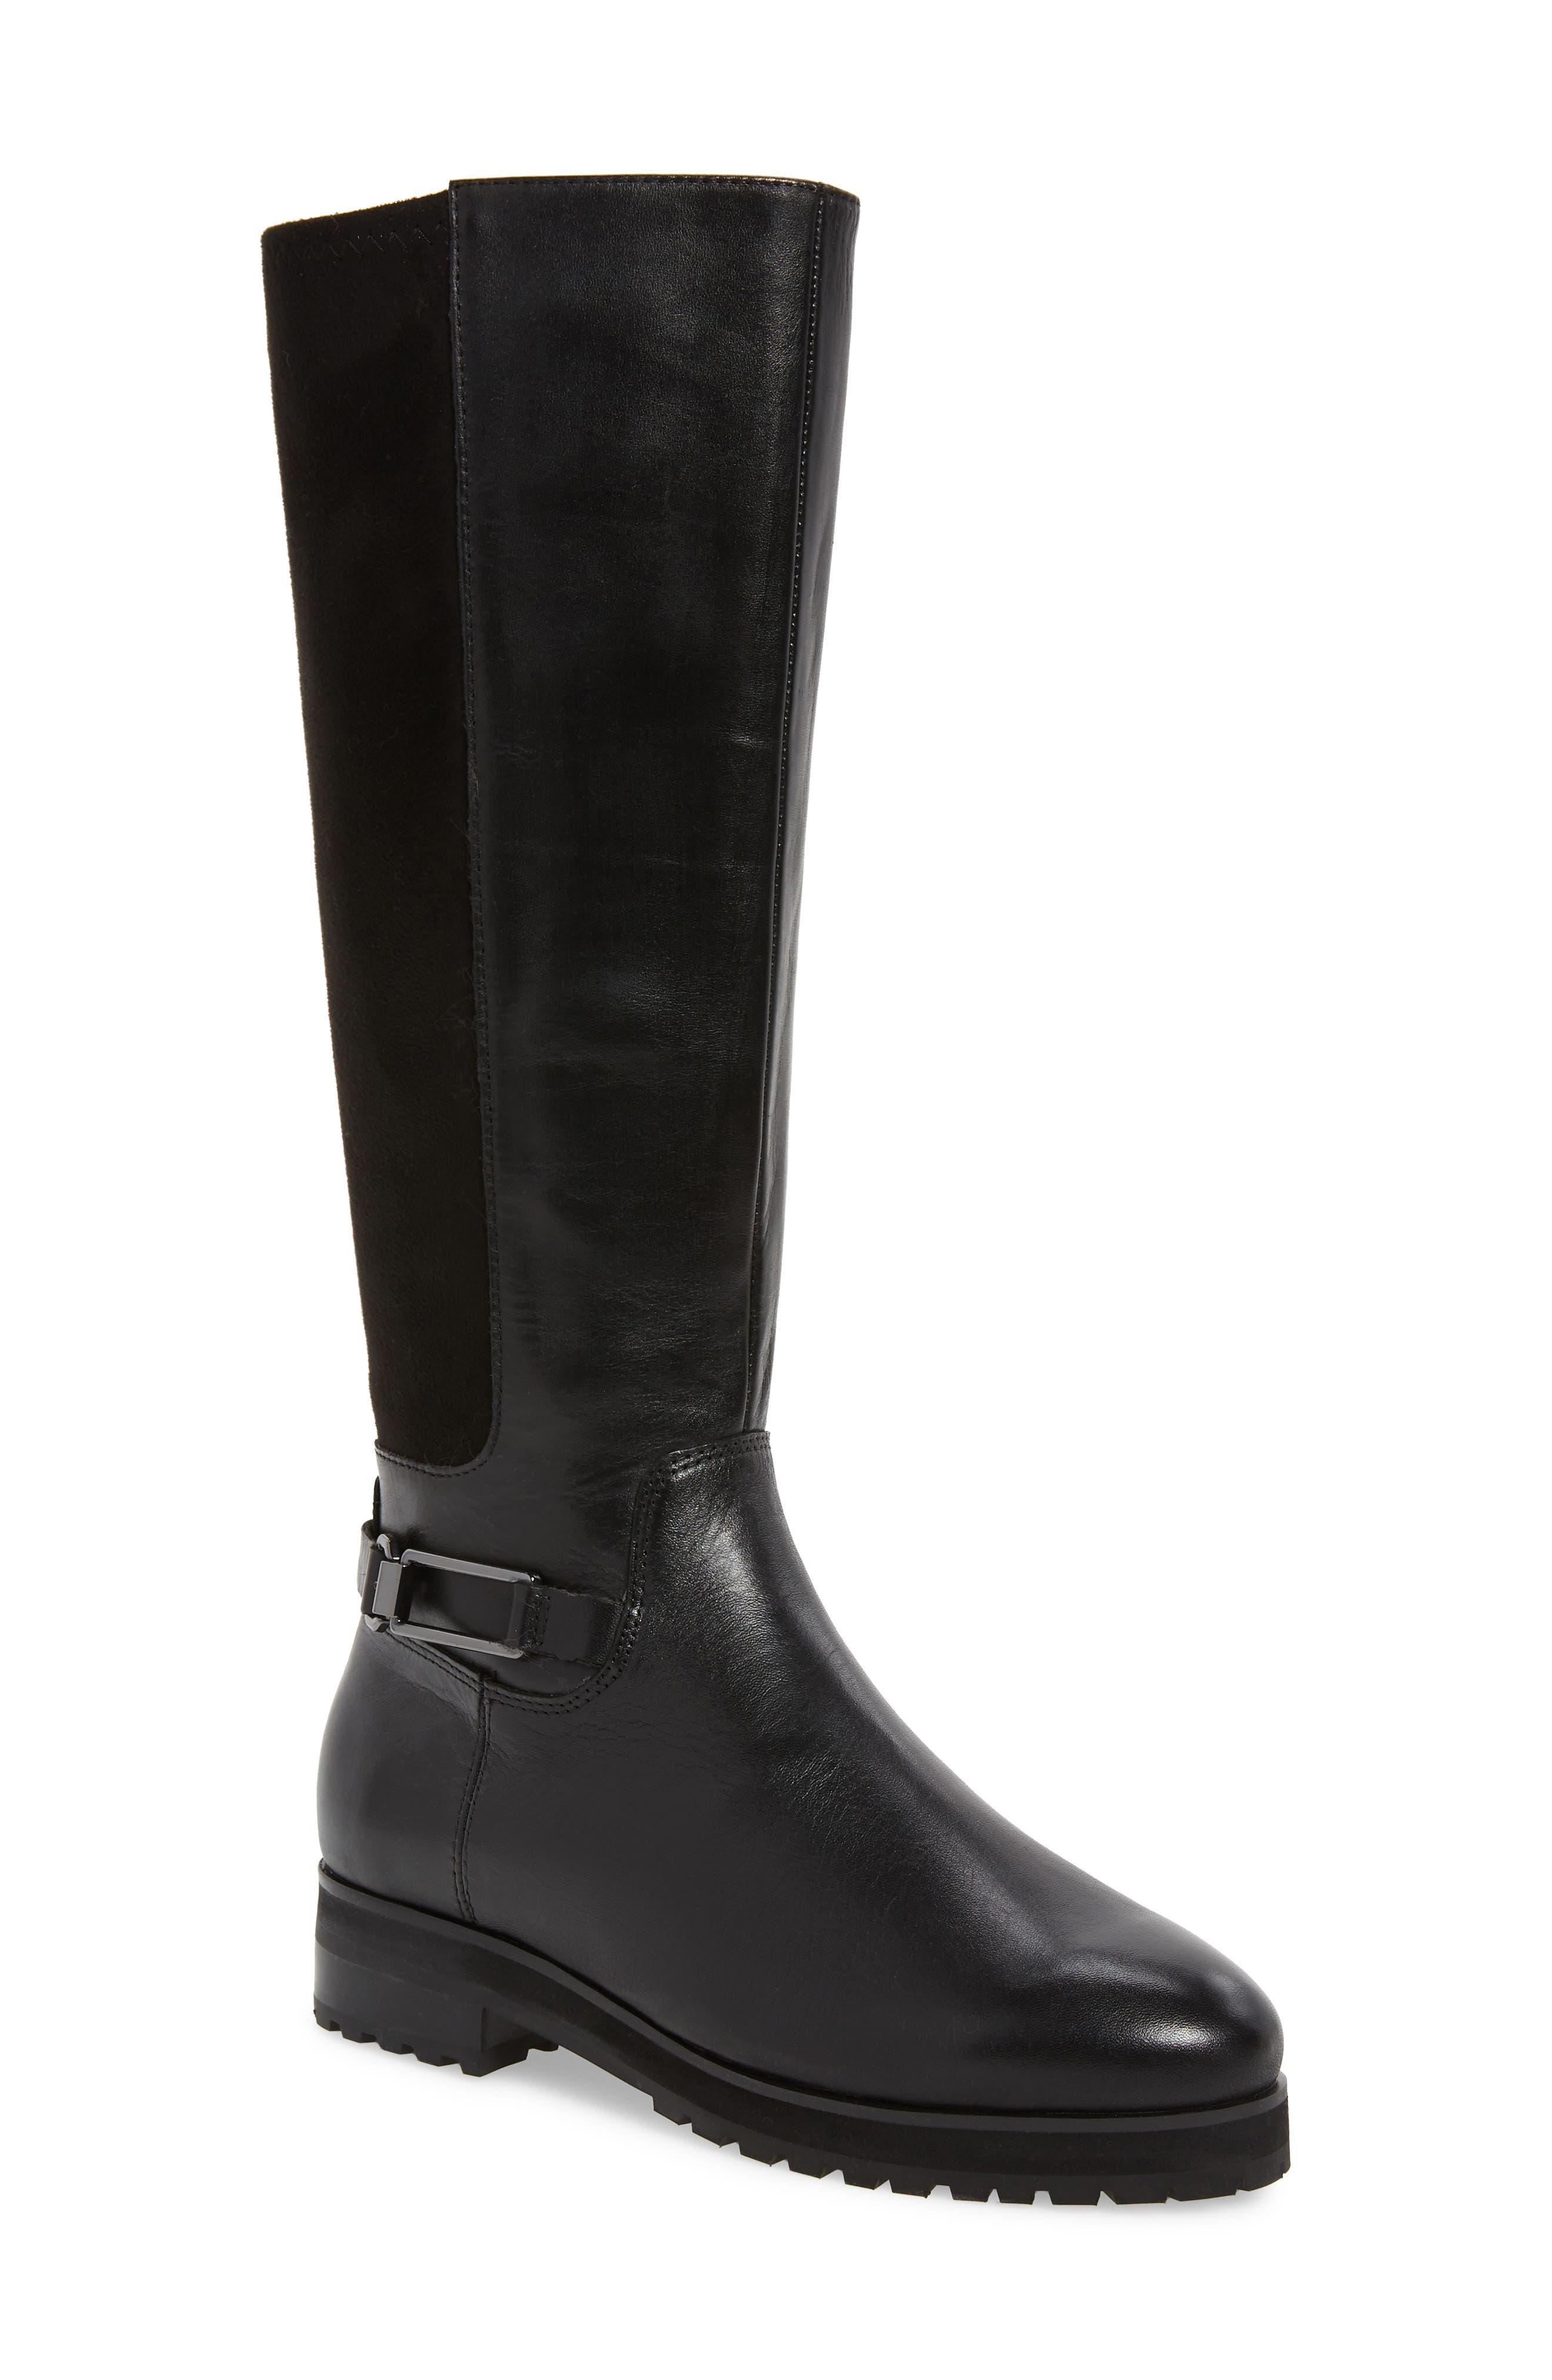 Sudini Frida Waterproof Knee High Boot, Black